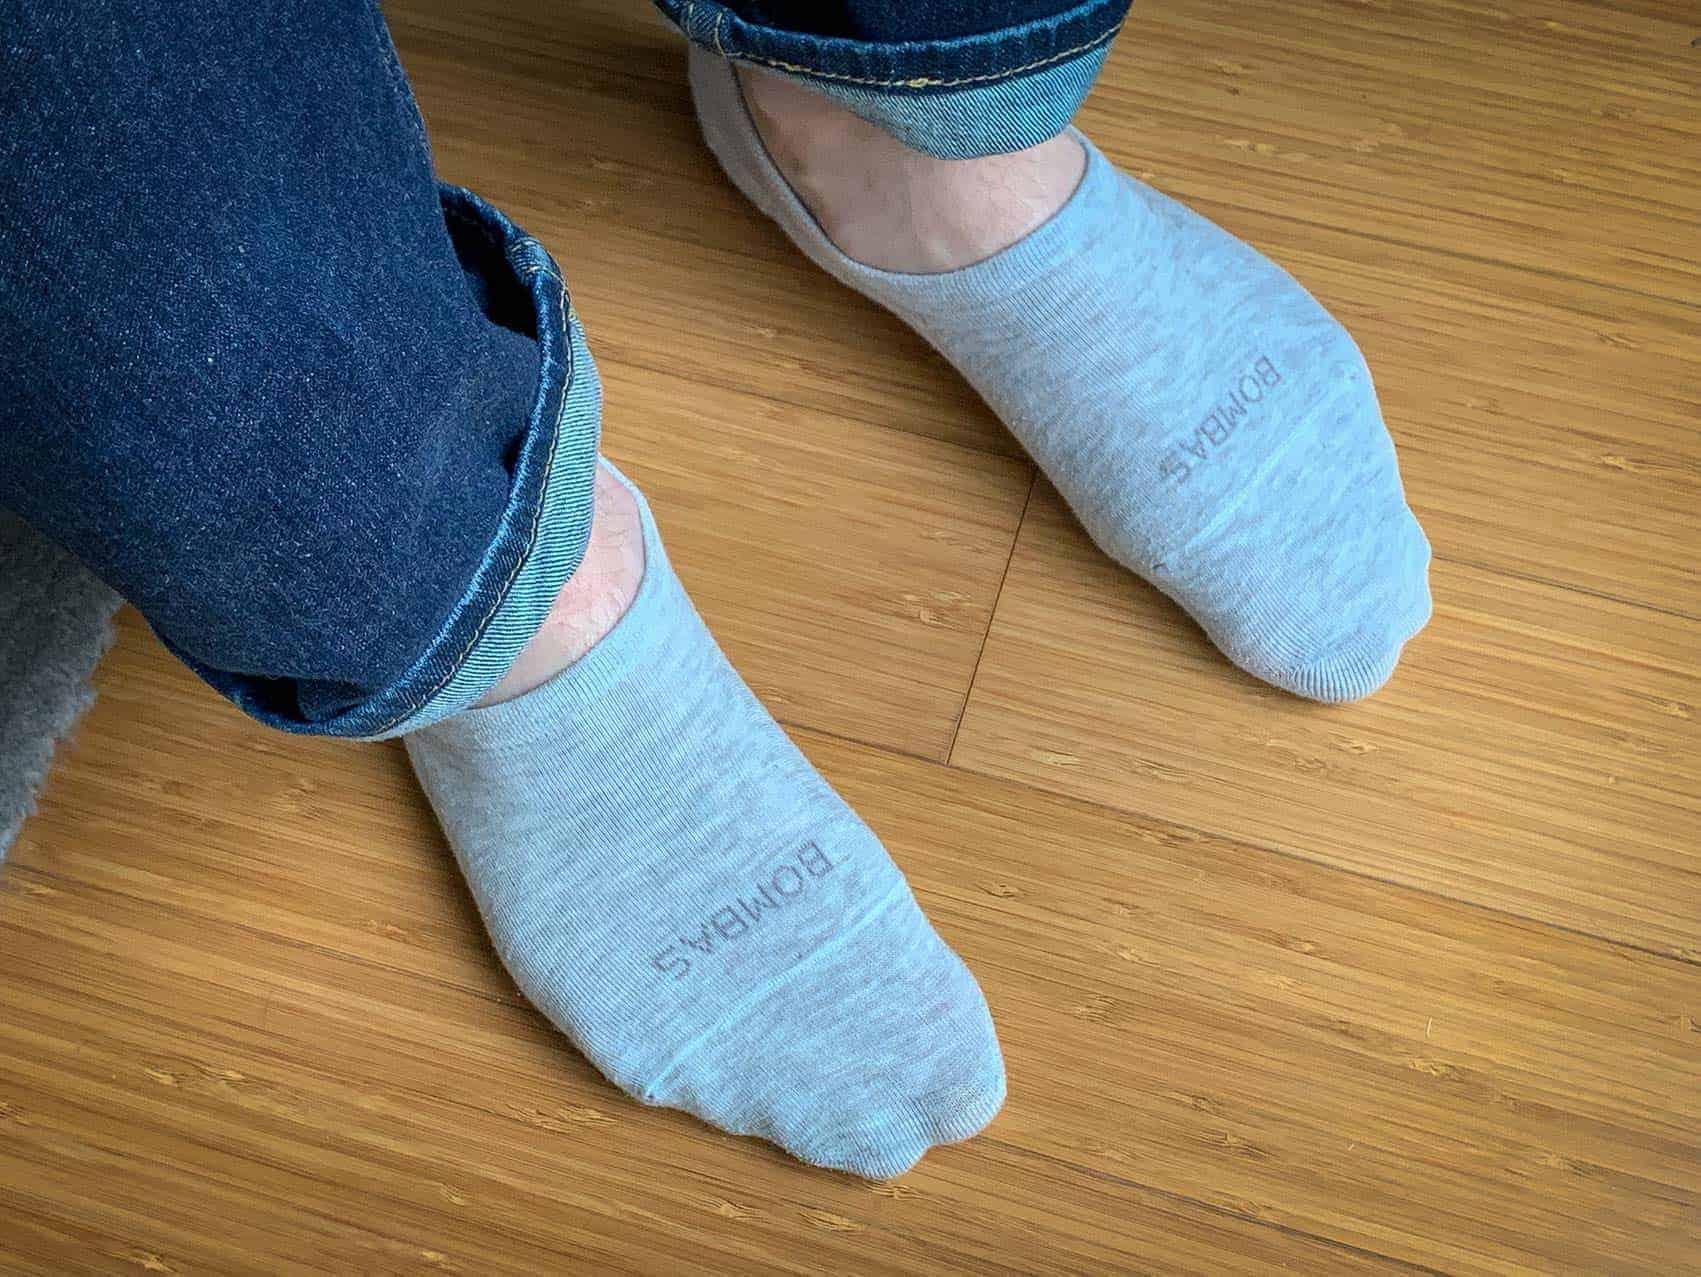 Bombas No Show Socks